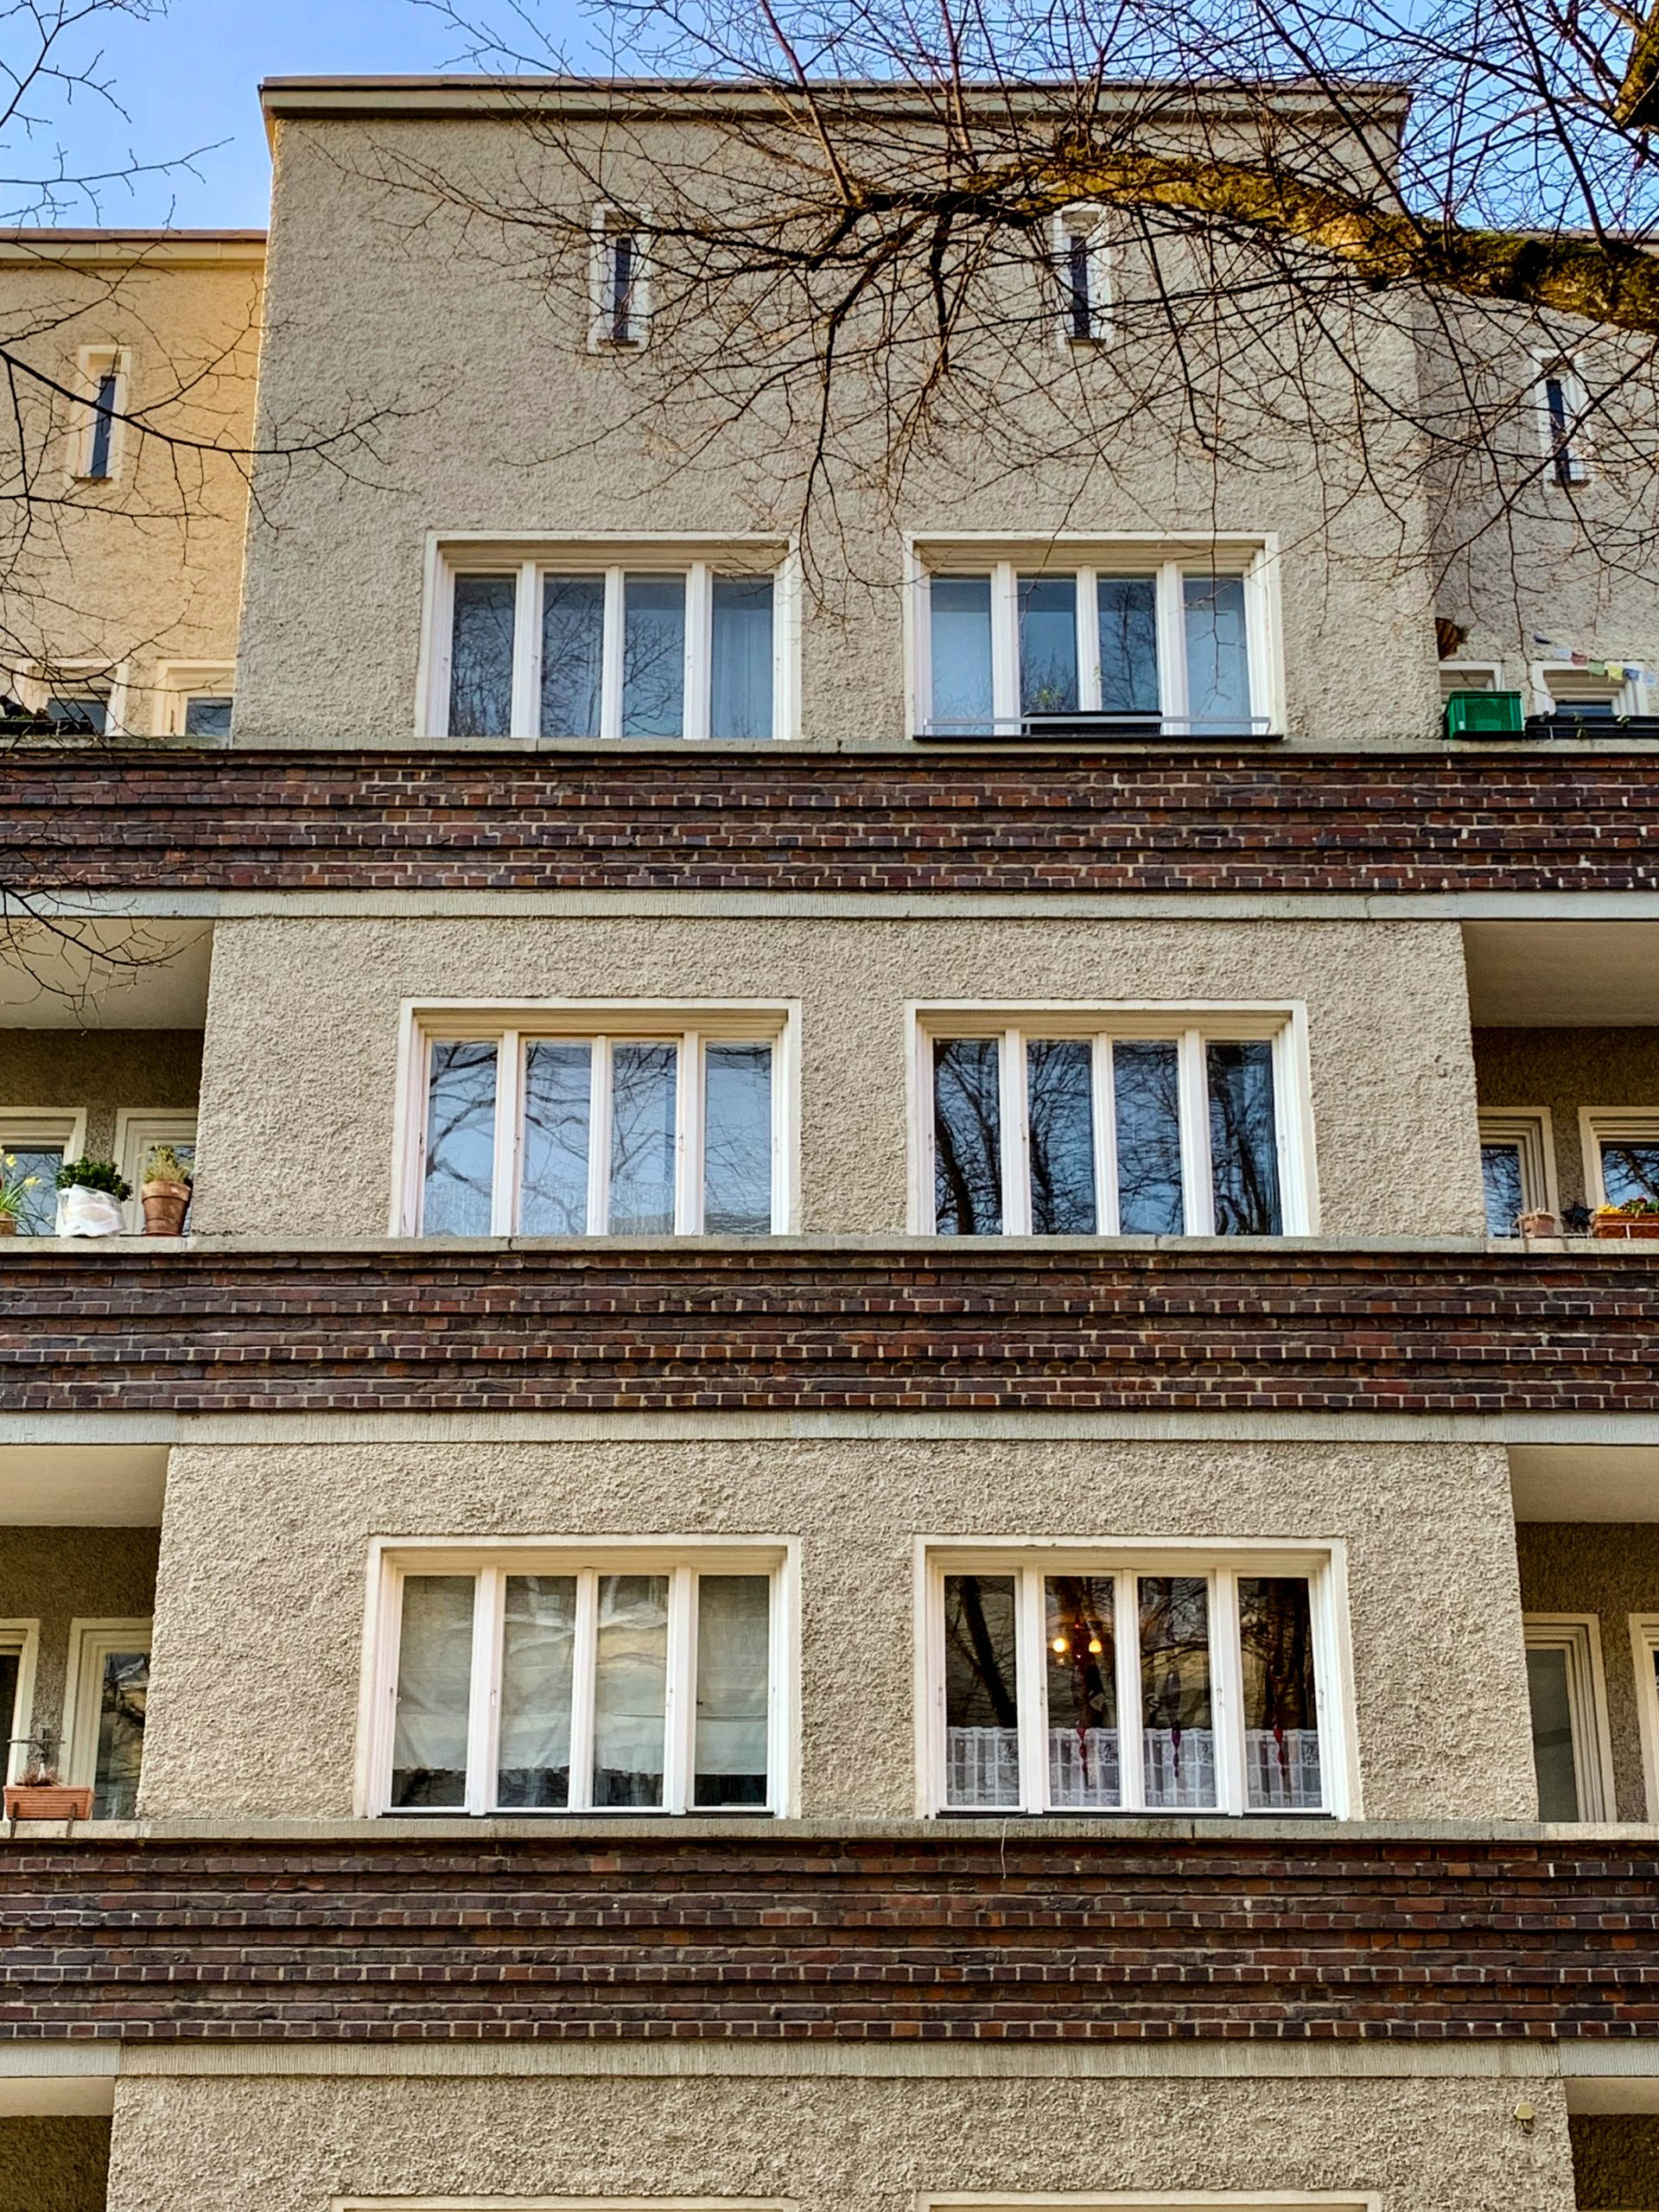 Wohnanlage, 1929-1930. Architekten: Otho Orlando Kurz, Eduard Herbert